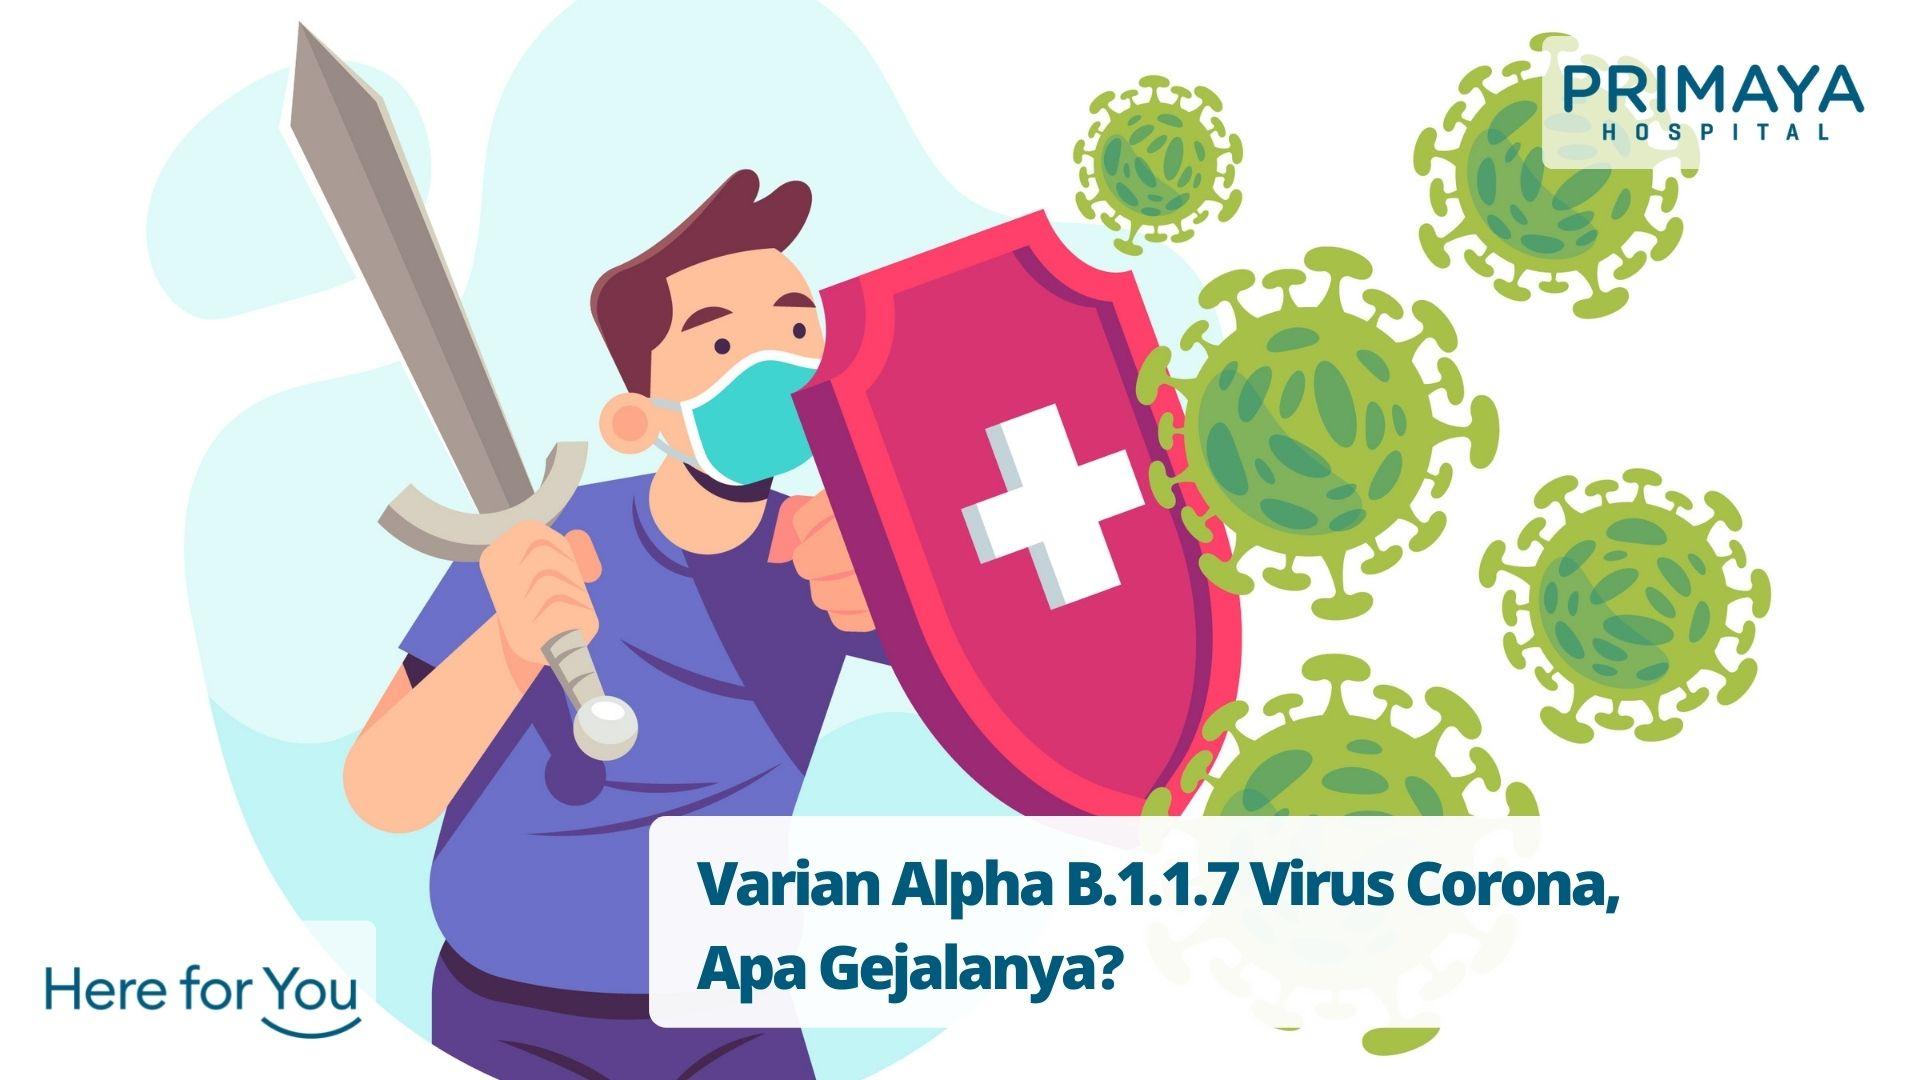 Varian Alpha B.1.1.7 Virus Corona, Apa Gejalanya?